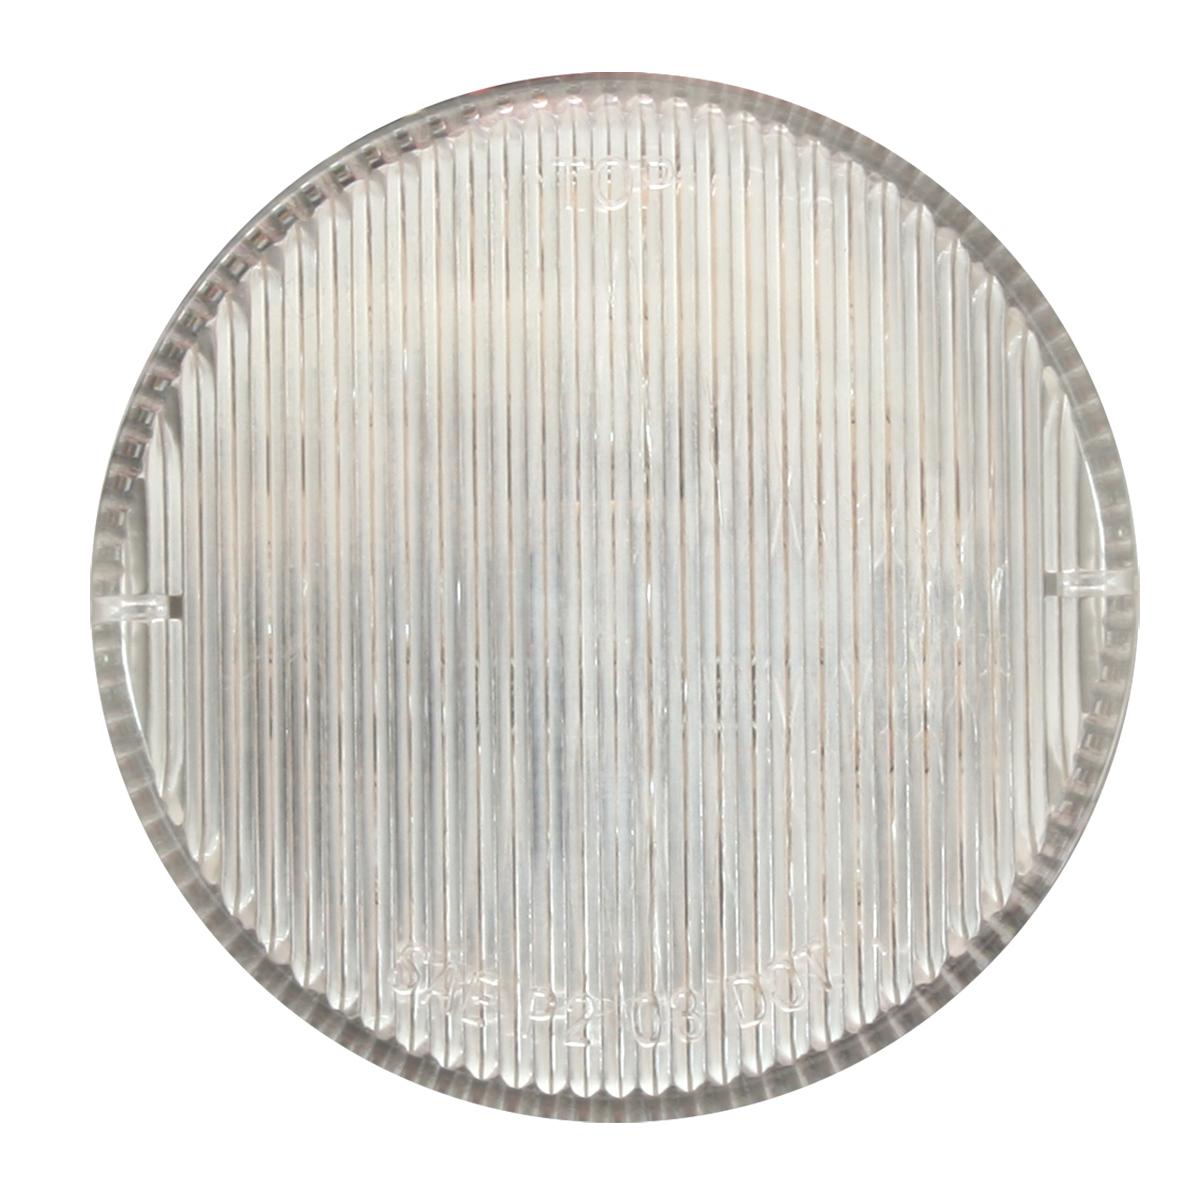 "2-1/2"" Round Fleet Marker Light in Clear Lens"